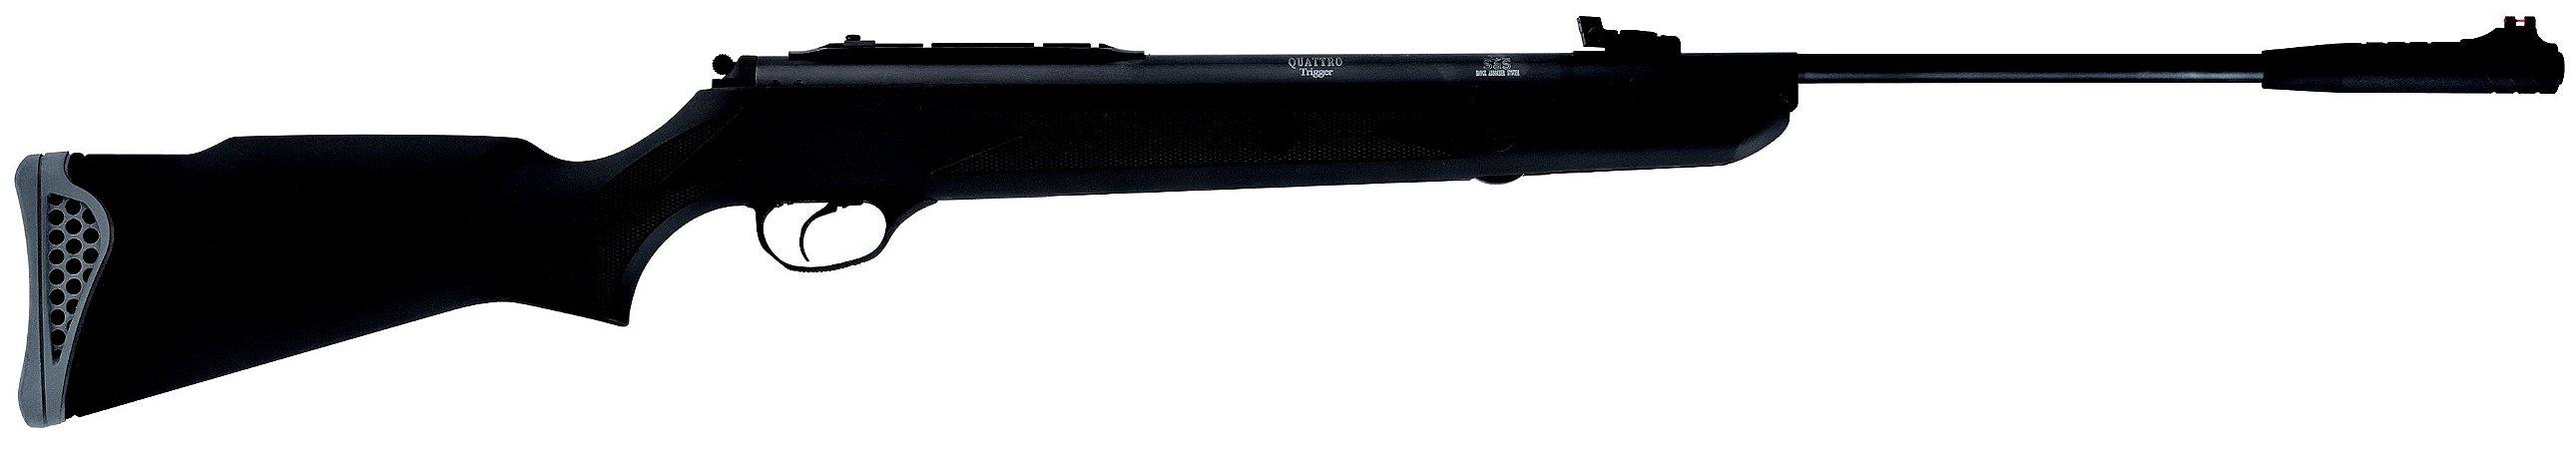 Carabina De Pressão Hatsan 125 6mm GR Magnum - Rossi